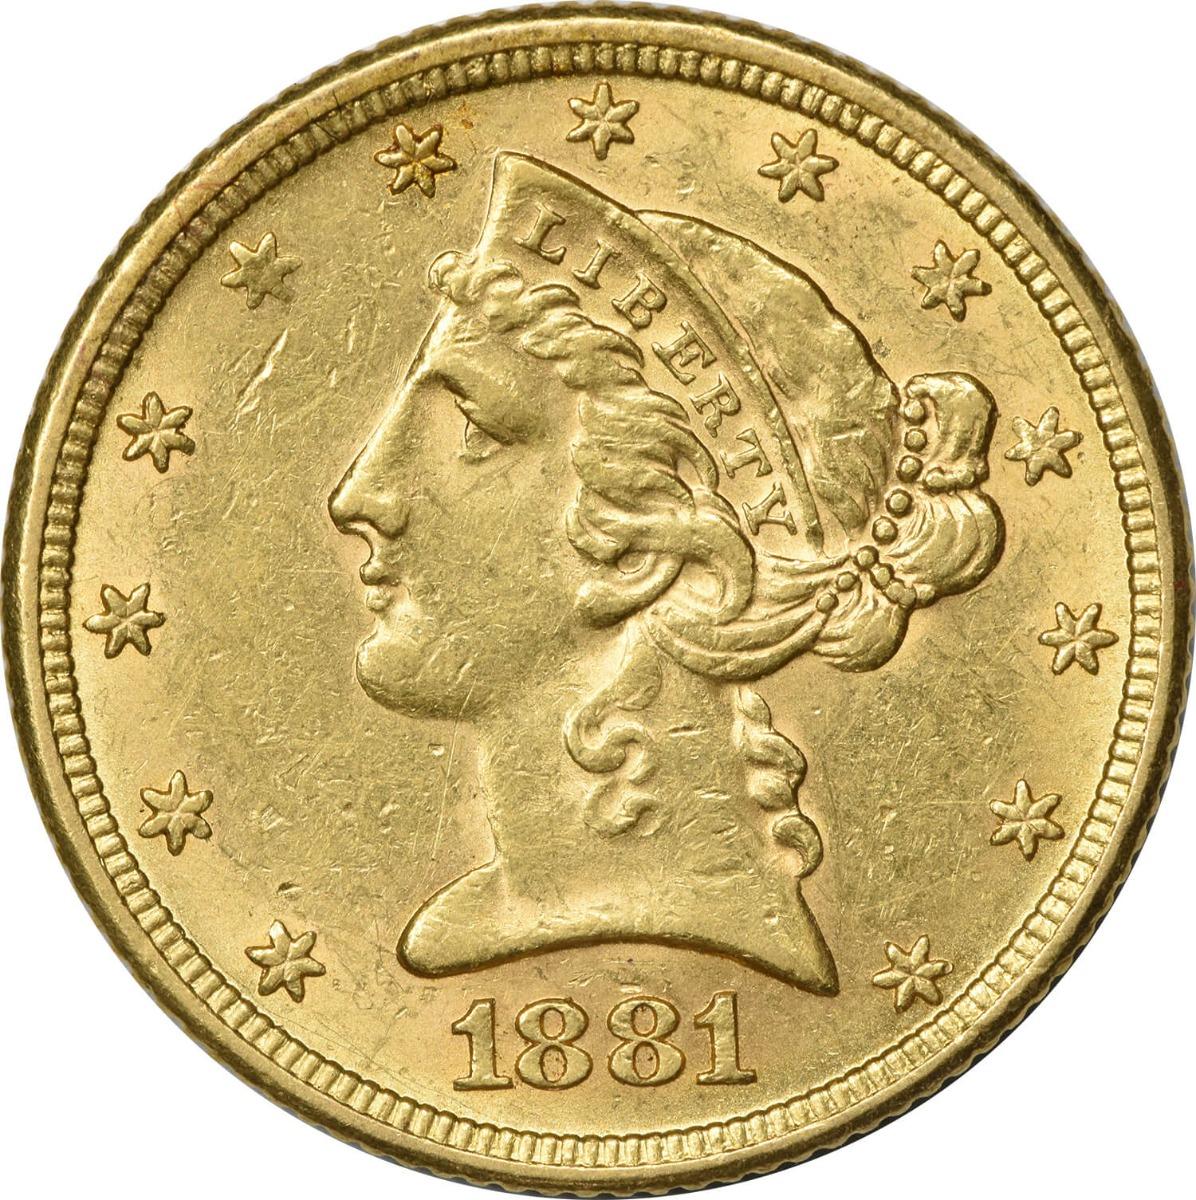 $5 Gold Liberty Half Eagle Random Date in the 1880's graded AU58